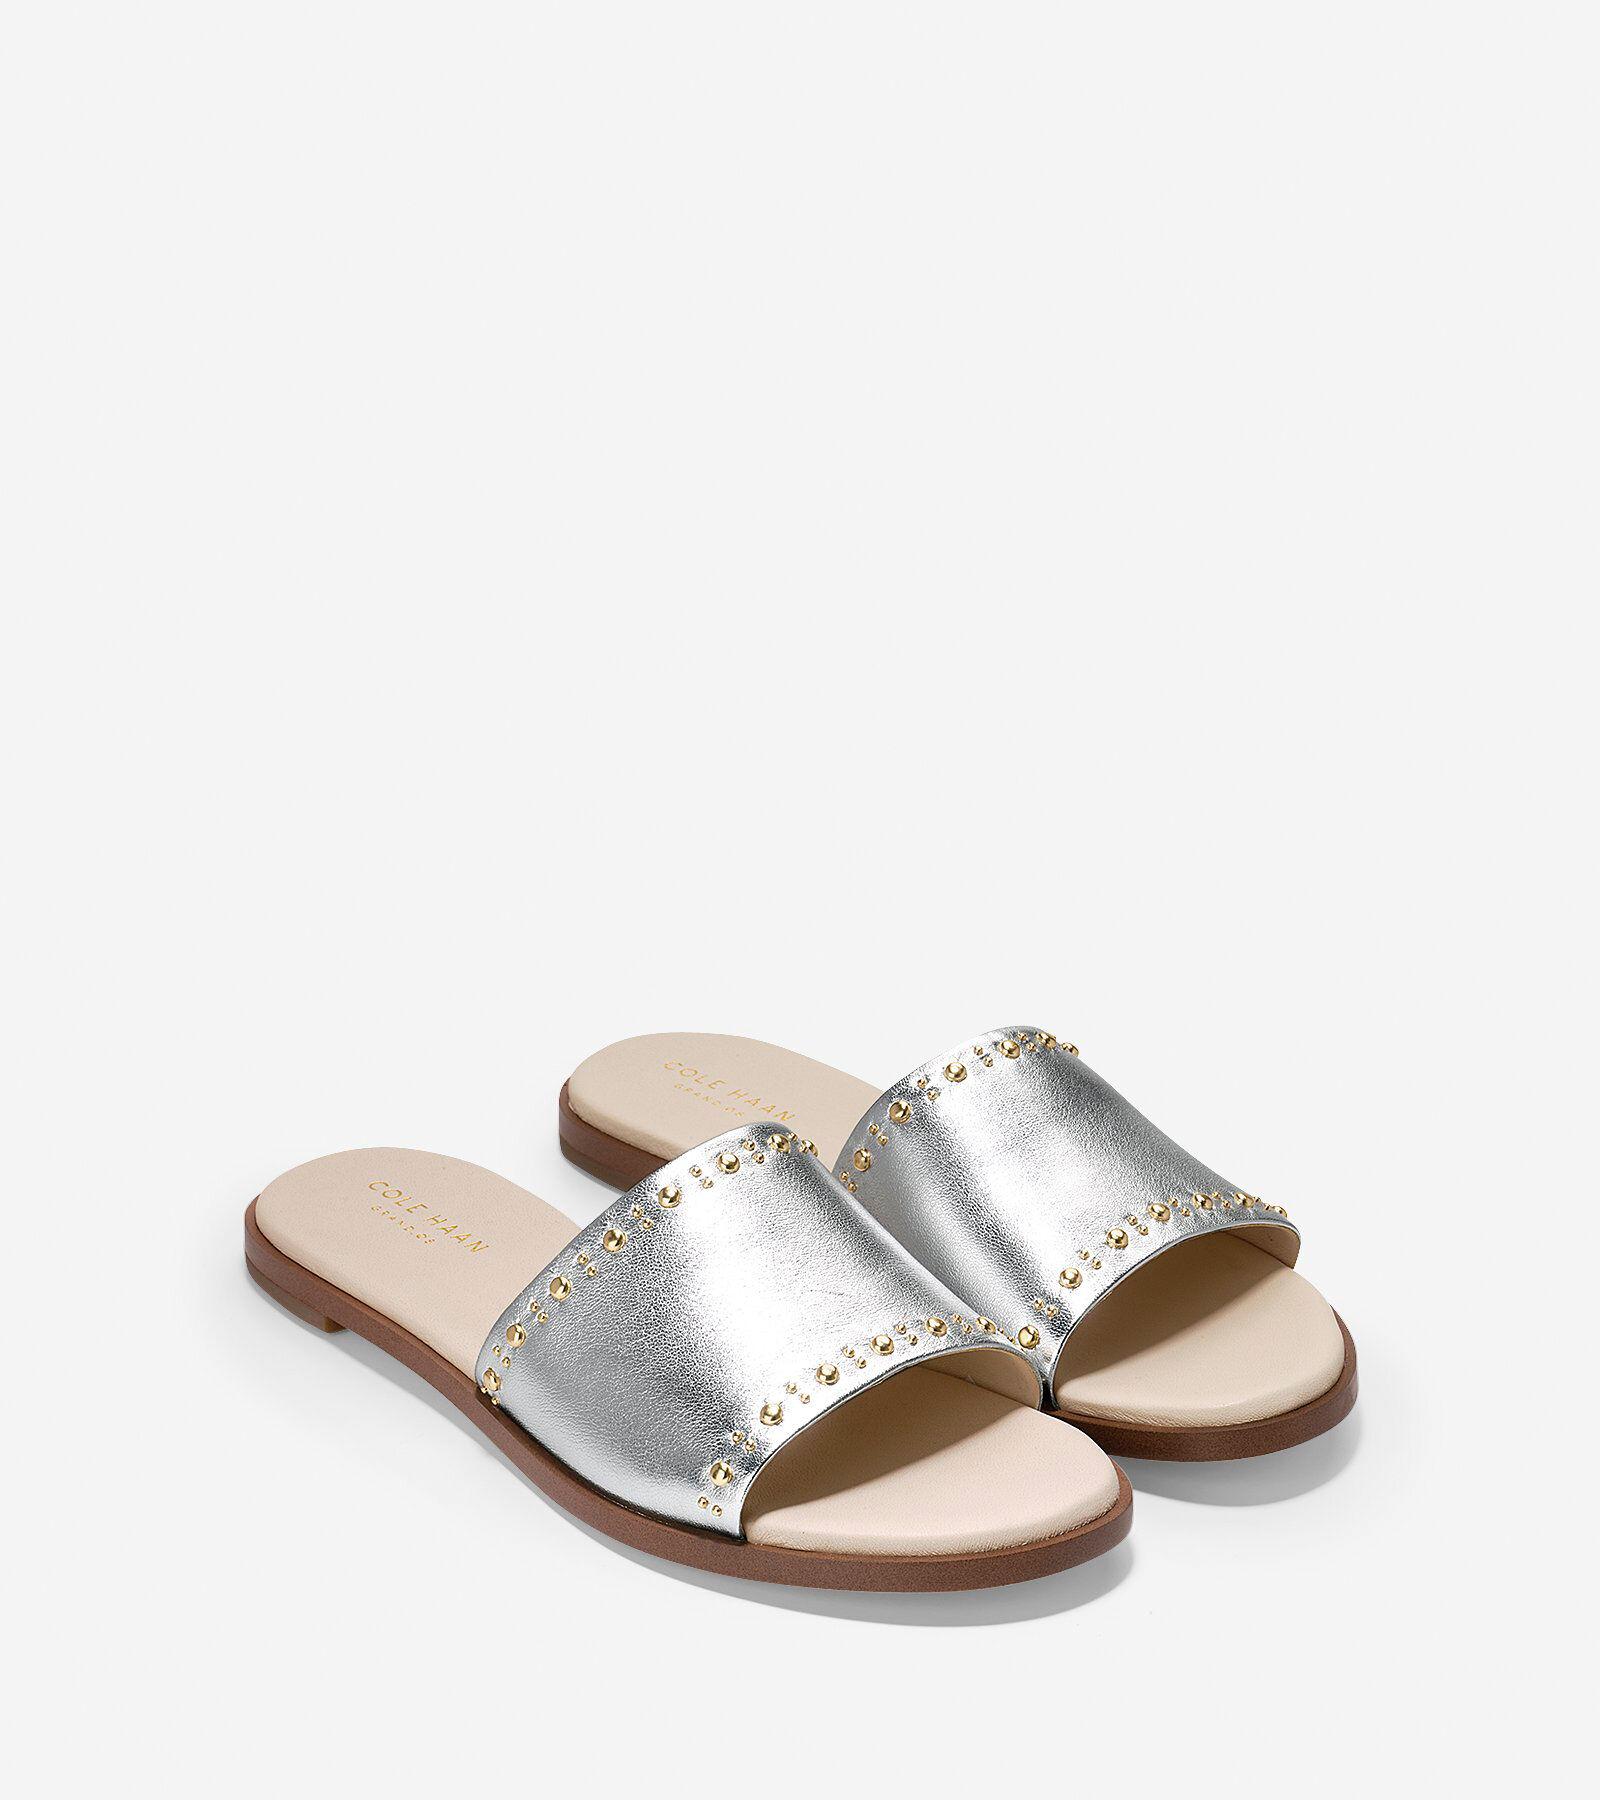 Cole Haan Anica Metallic Slide Sandals 5Sa7EKf